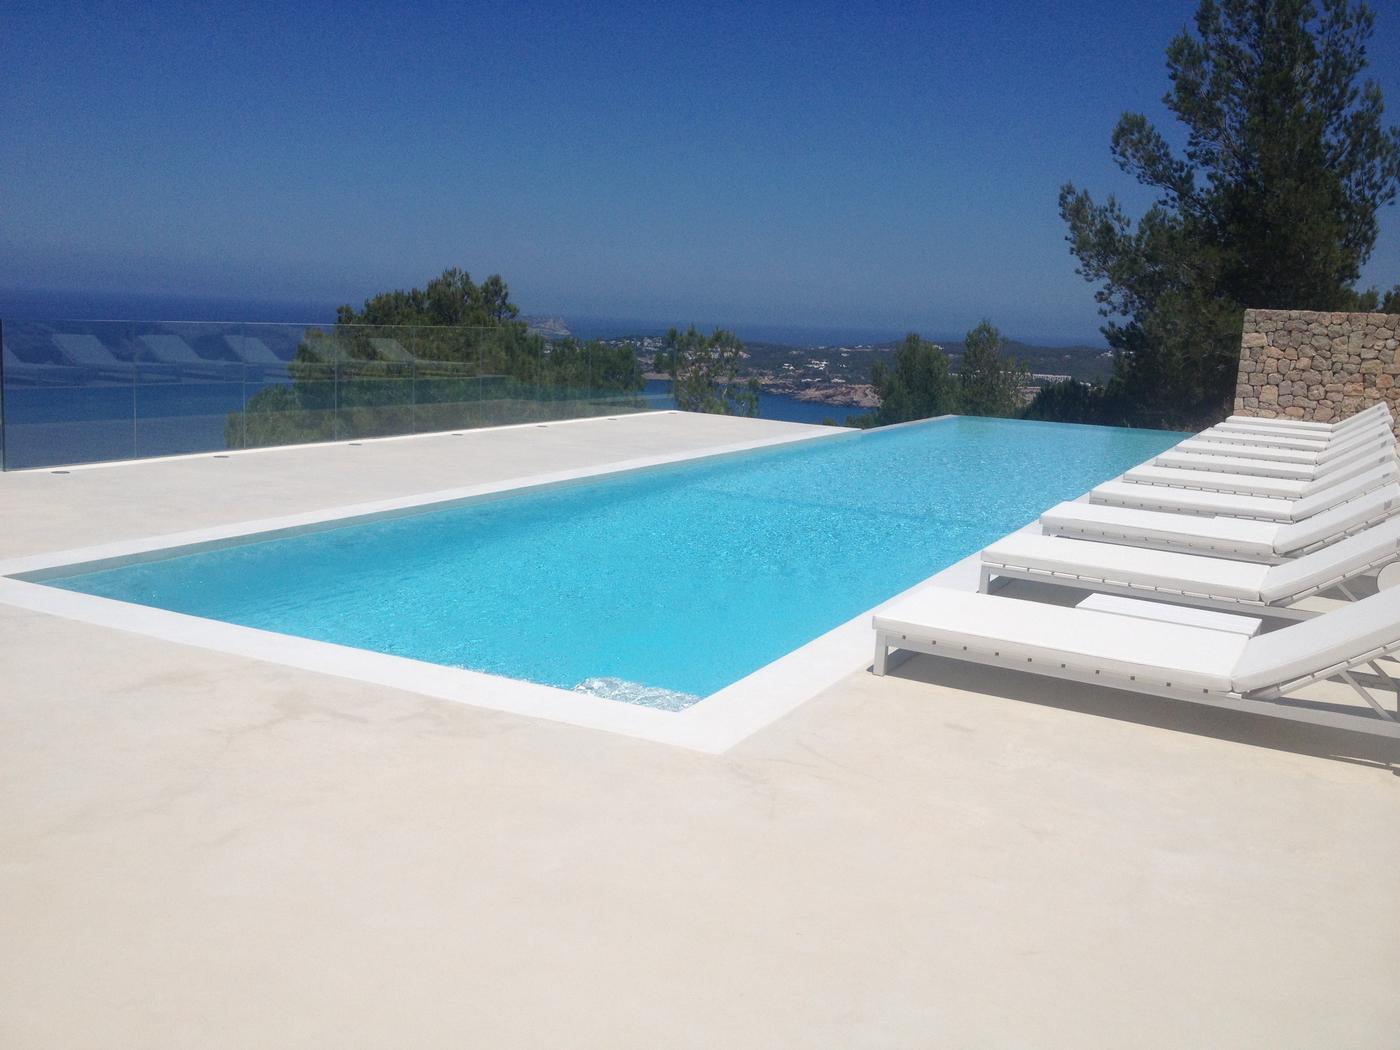 terrasse piscine en beton decoratif